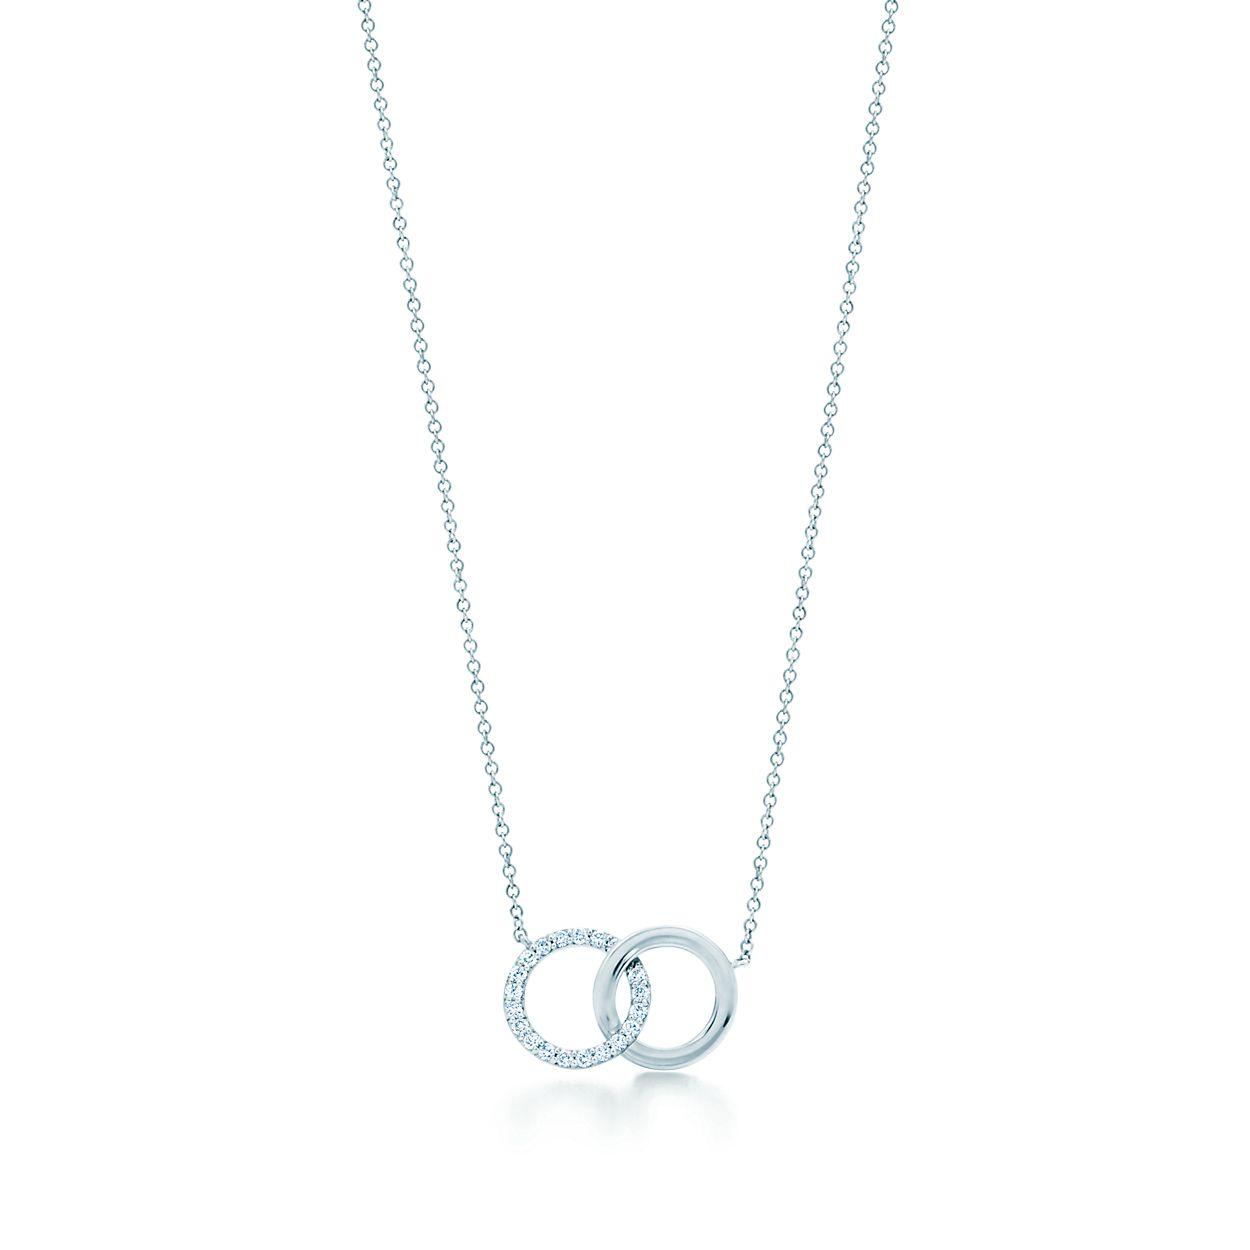 43e5506fe Tiffany 1837 Interlocking Circles Pendant In 18k White Gold With